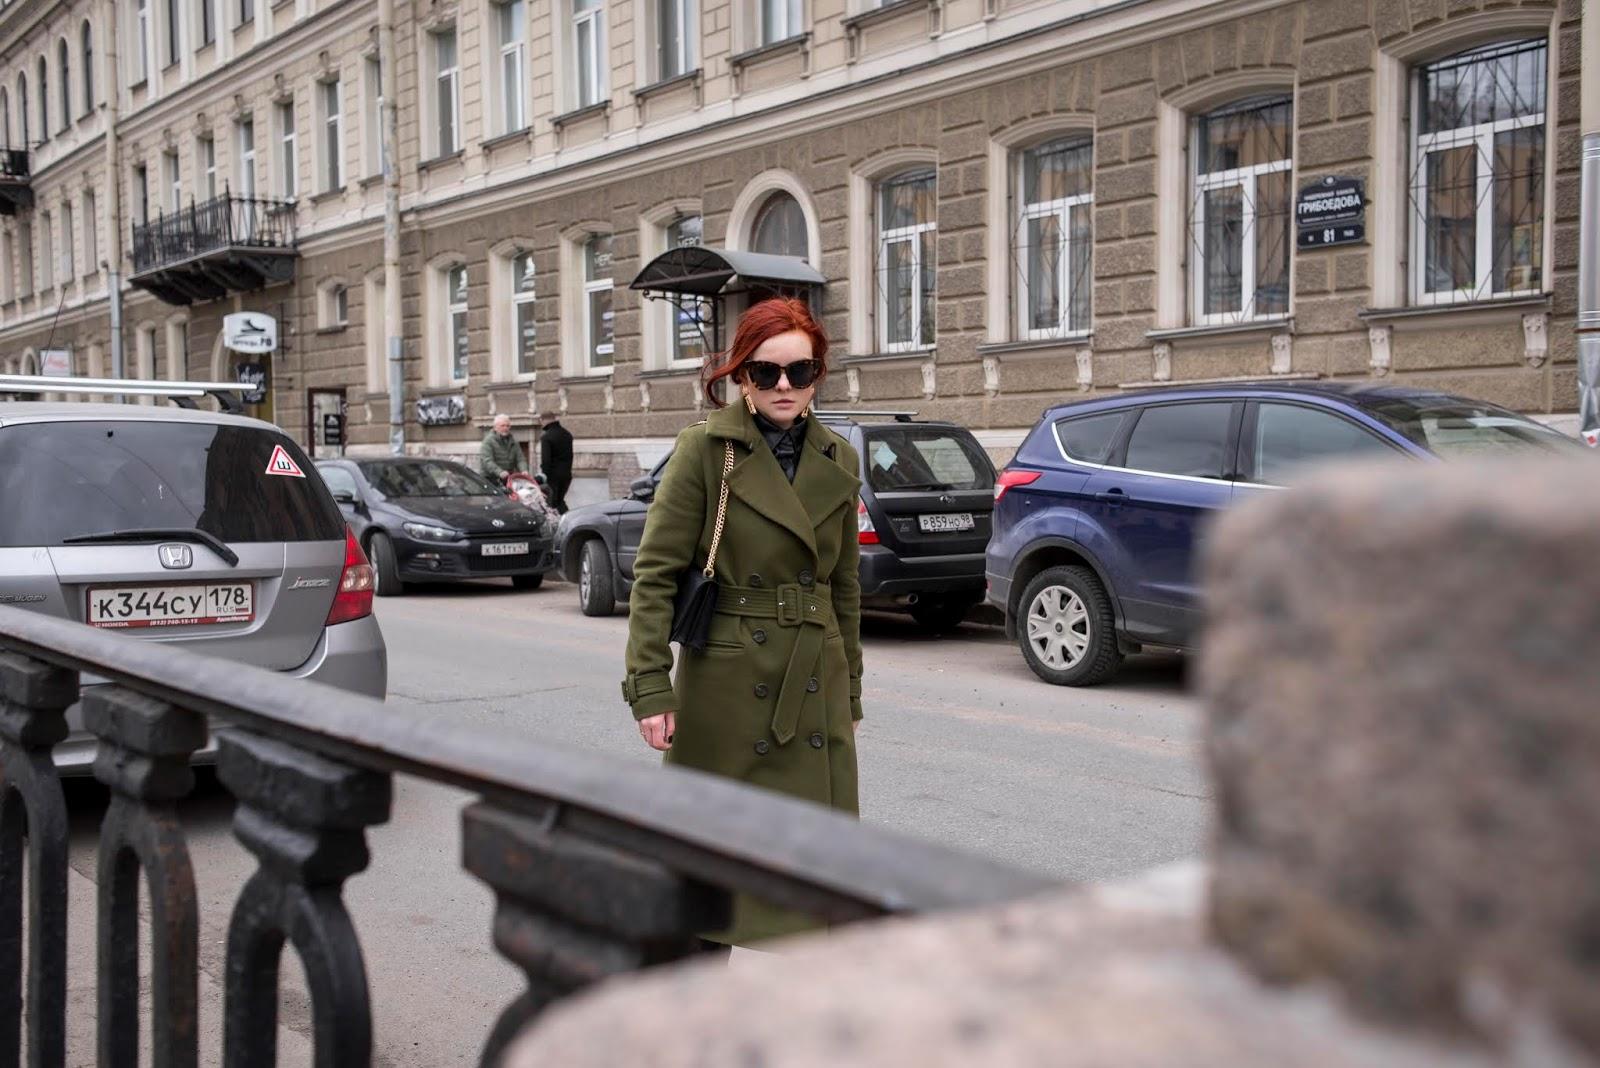 http://www.recklessdiary.ru/2019/04/gde-kupit-sheostyanoe-kashemirovoe-palto-all-we-need-russkie-dizajnery-rossijskie-marki-idealnoe-palto.html